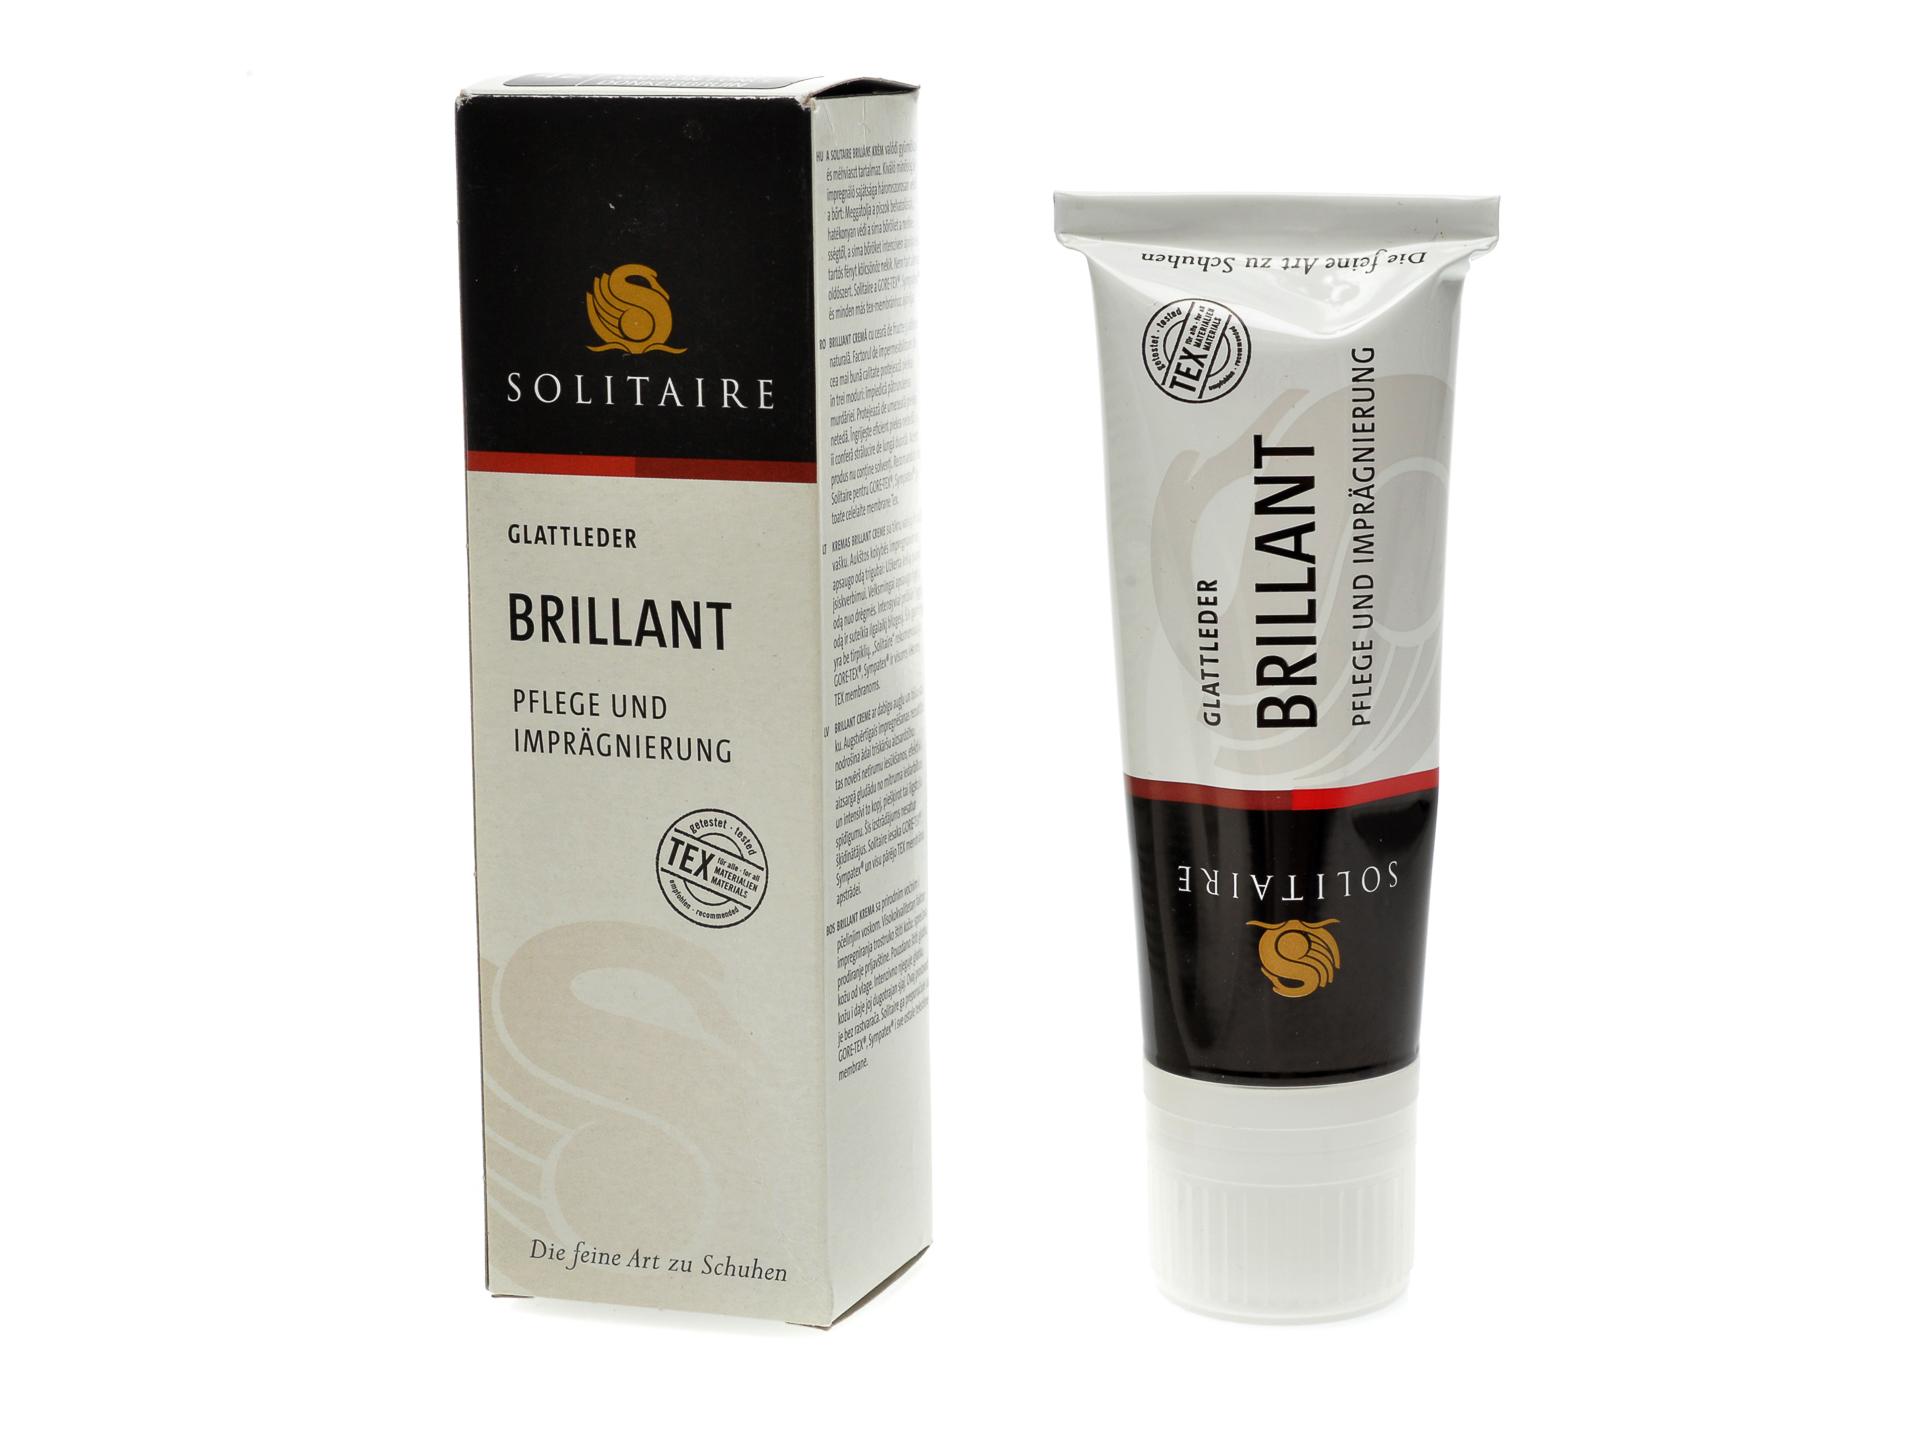 Crema de intretinere pentru incaltaminte, de culoare maro inchis, Solitaire imagine otter.ro 2021